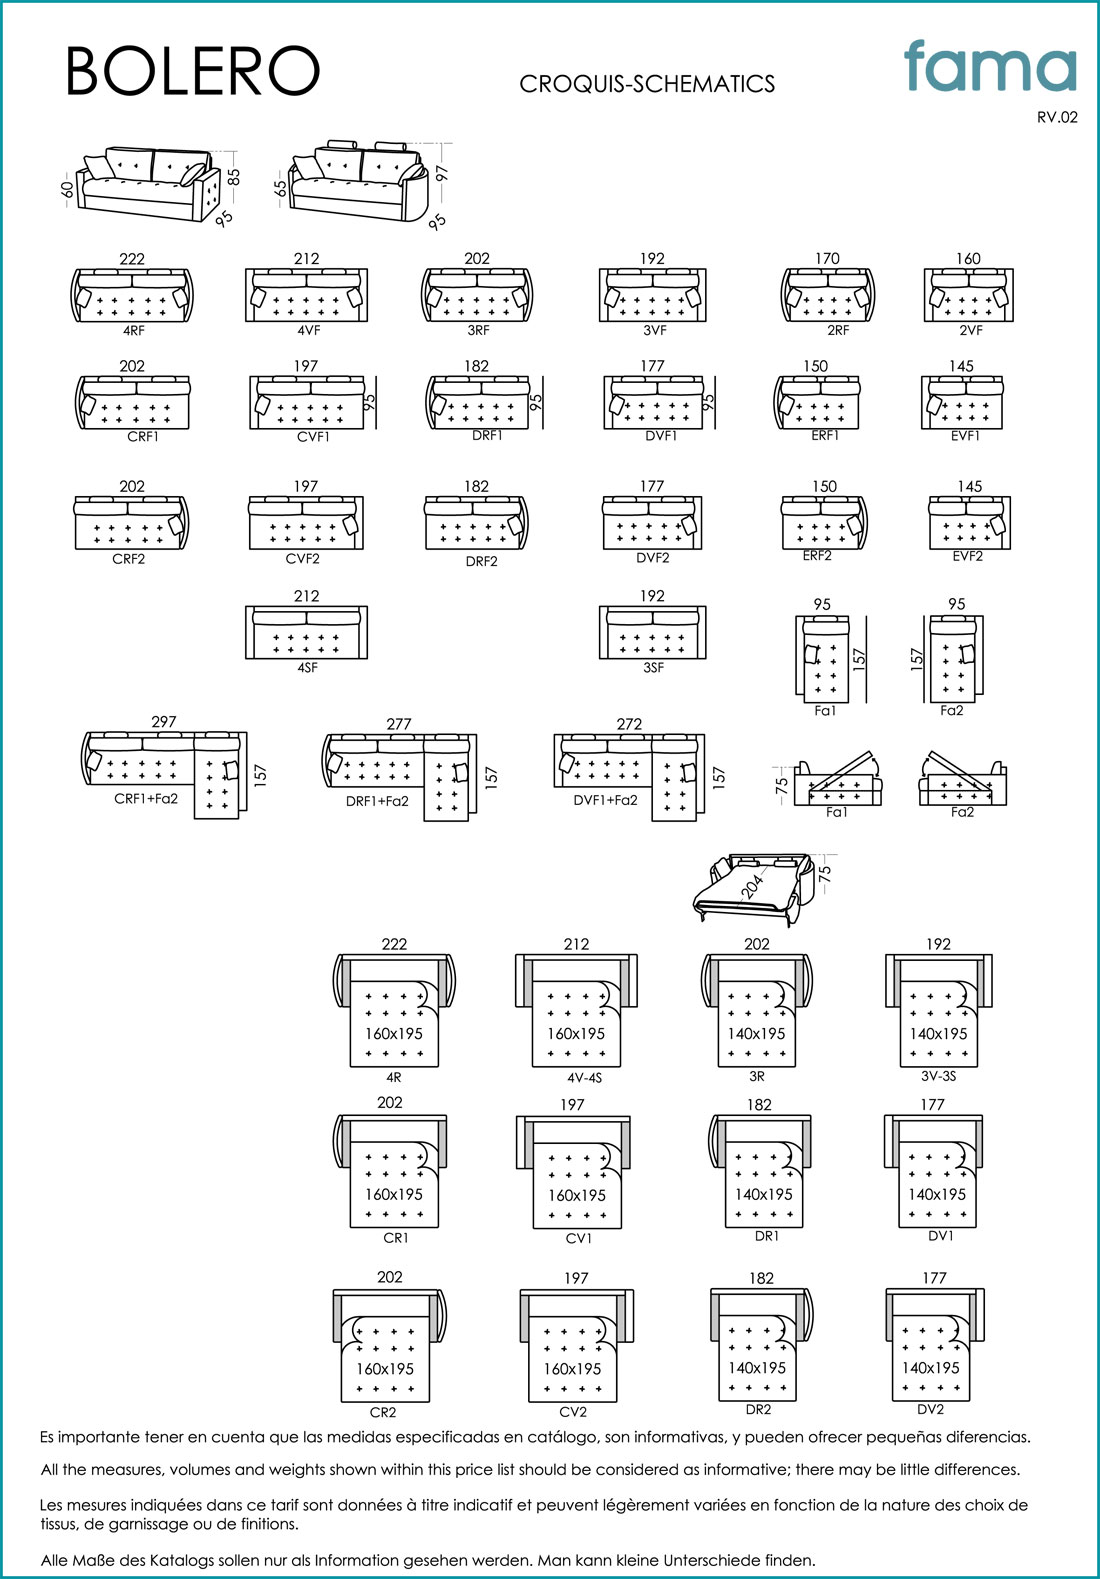 sofa-lit-contemporaine-meubles-modernes-famaliving-montreal-specifications